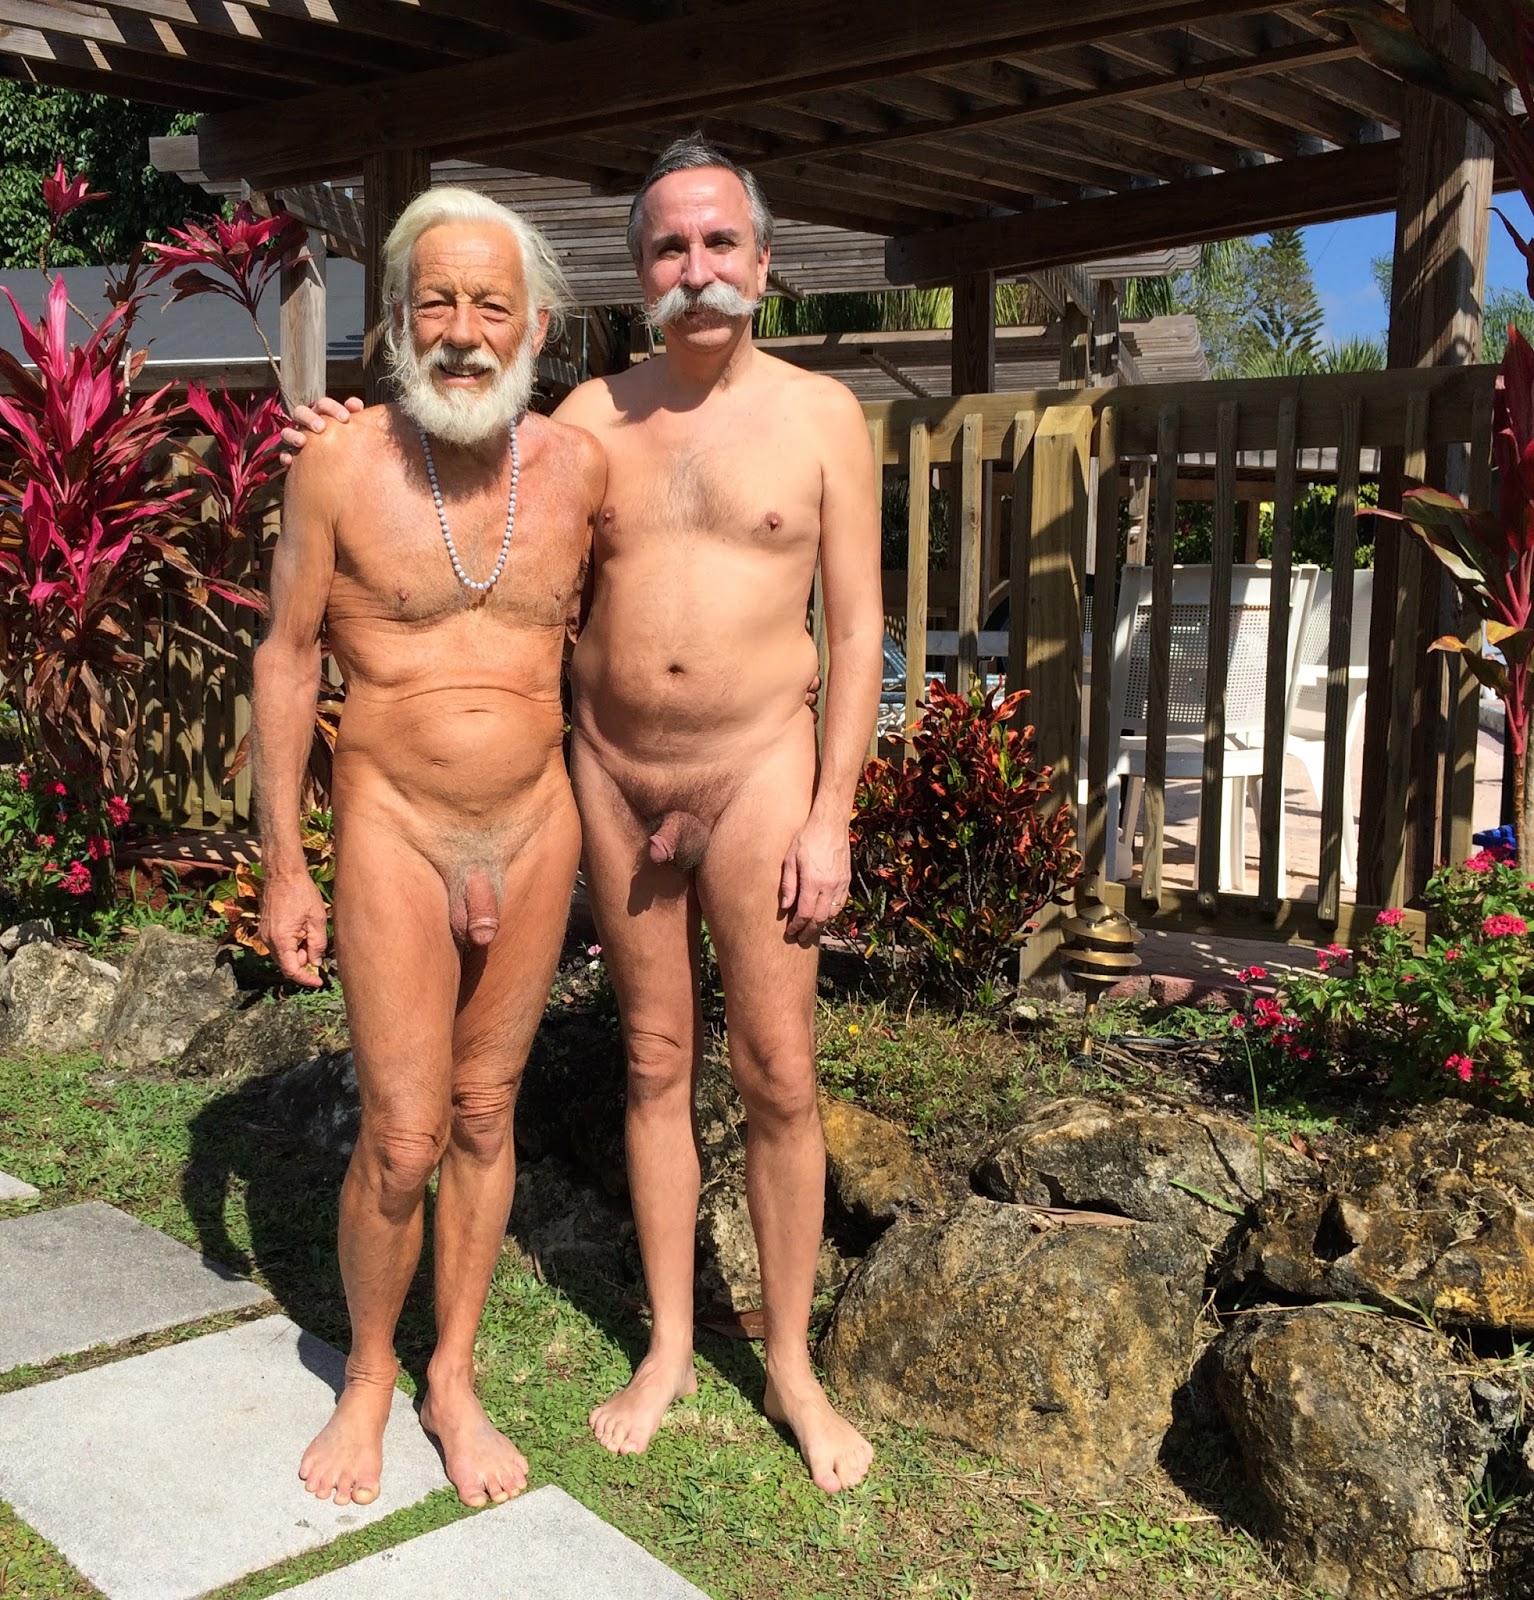 Nudist club ontario